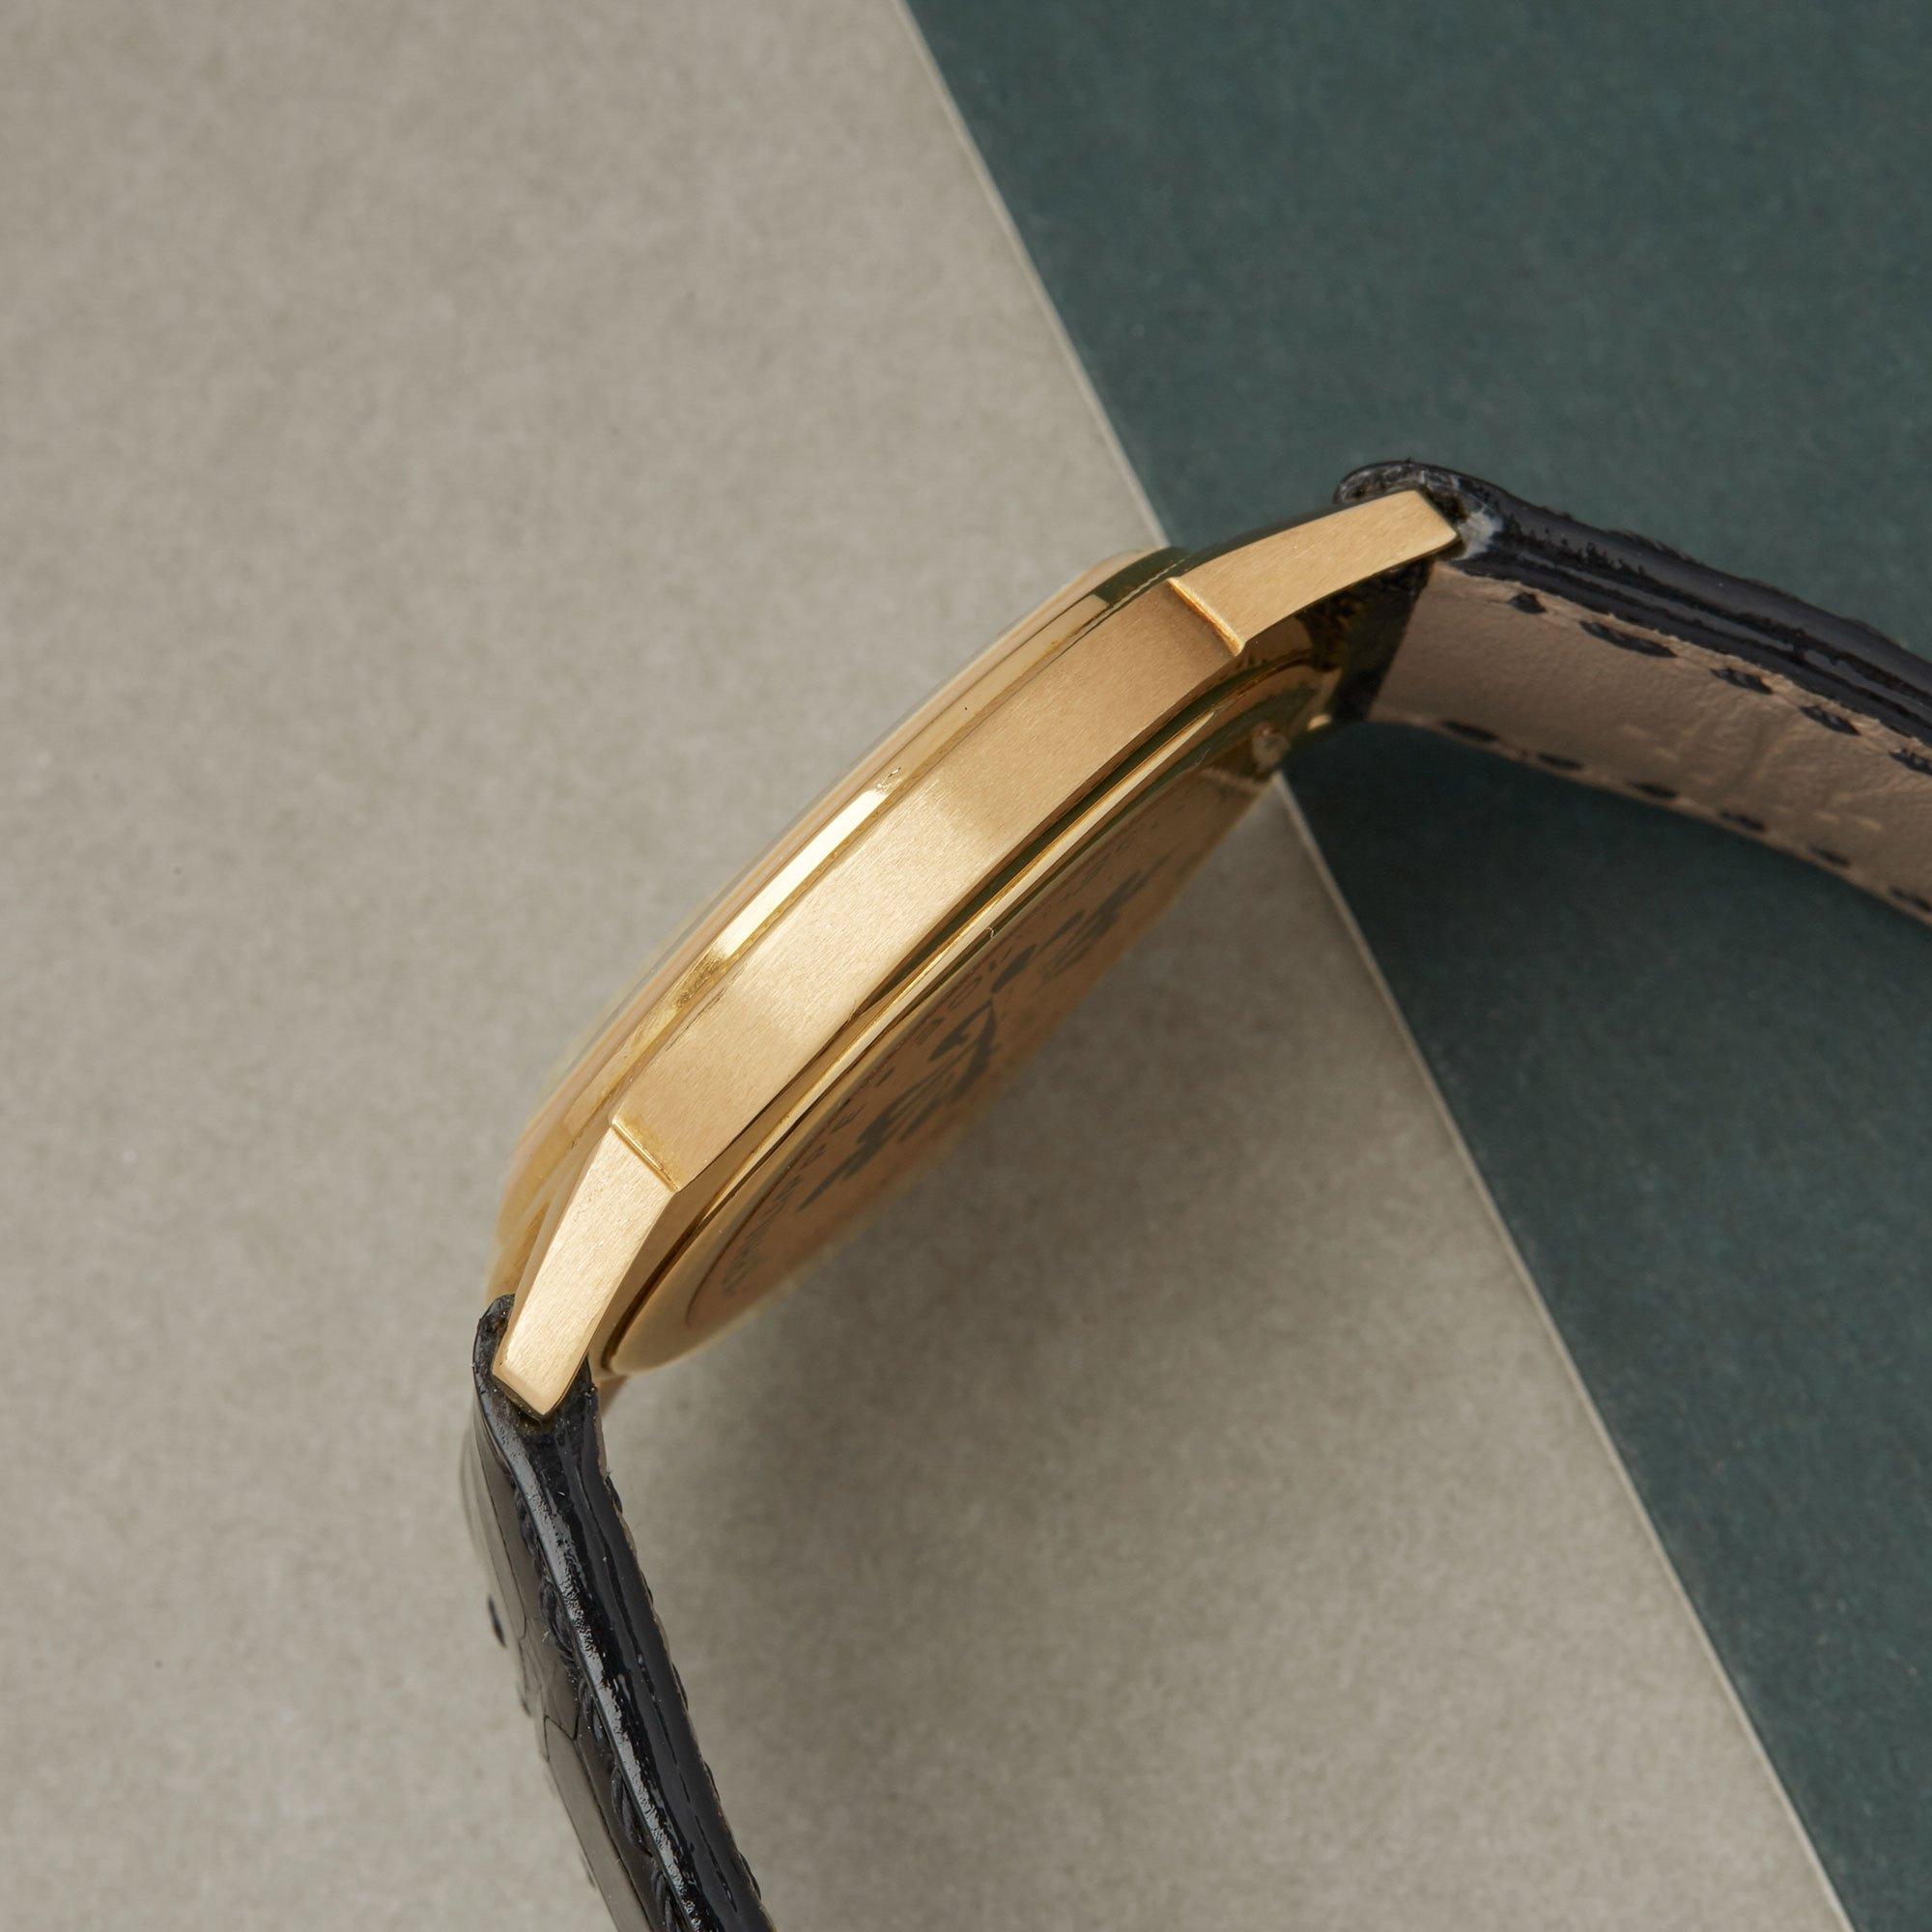 Patek Philippe Calatrava 18K Yellow Gold 3602